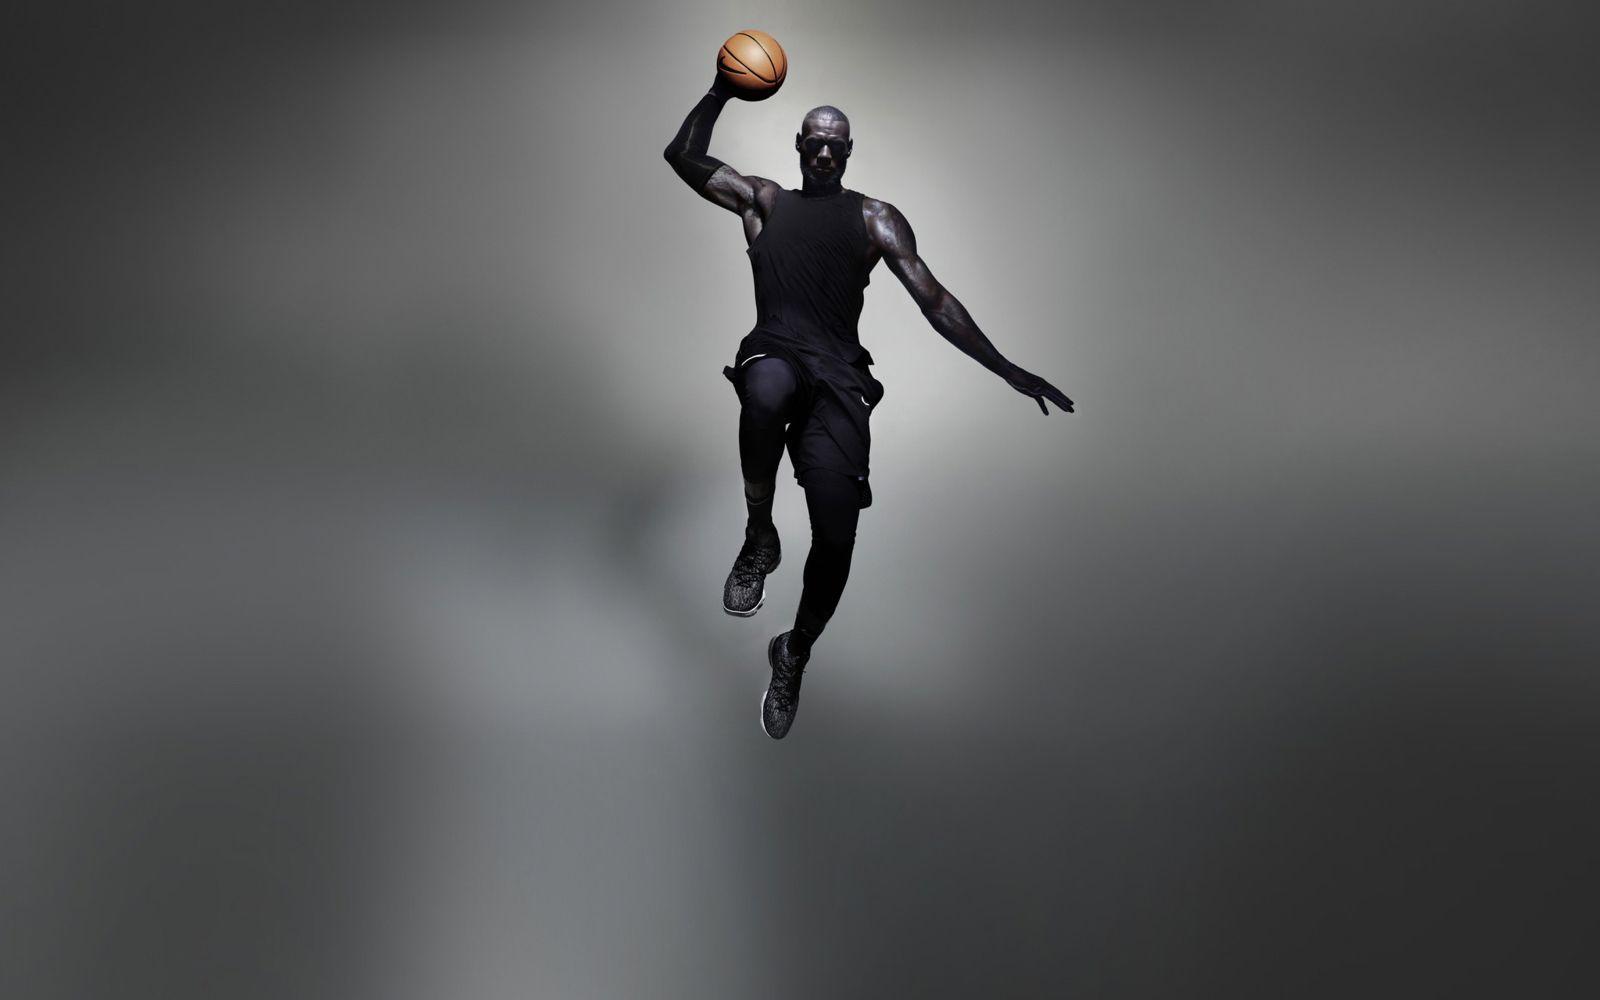 Lebron Nike Wallpaper: Nike LeBron 16 Wallpapers